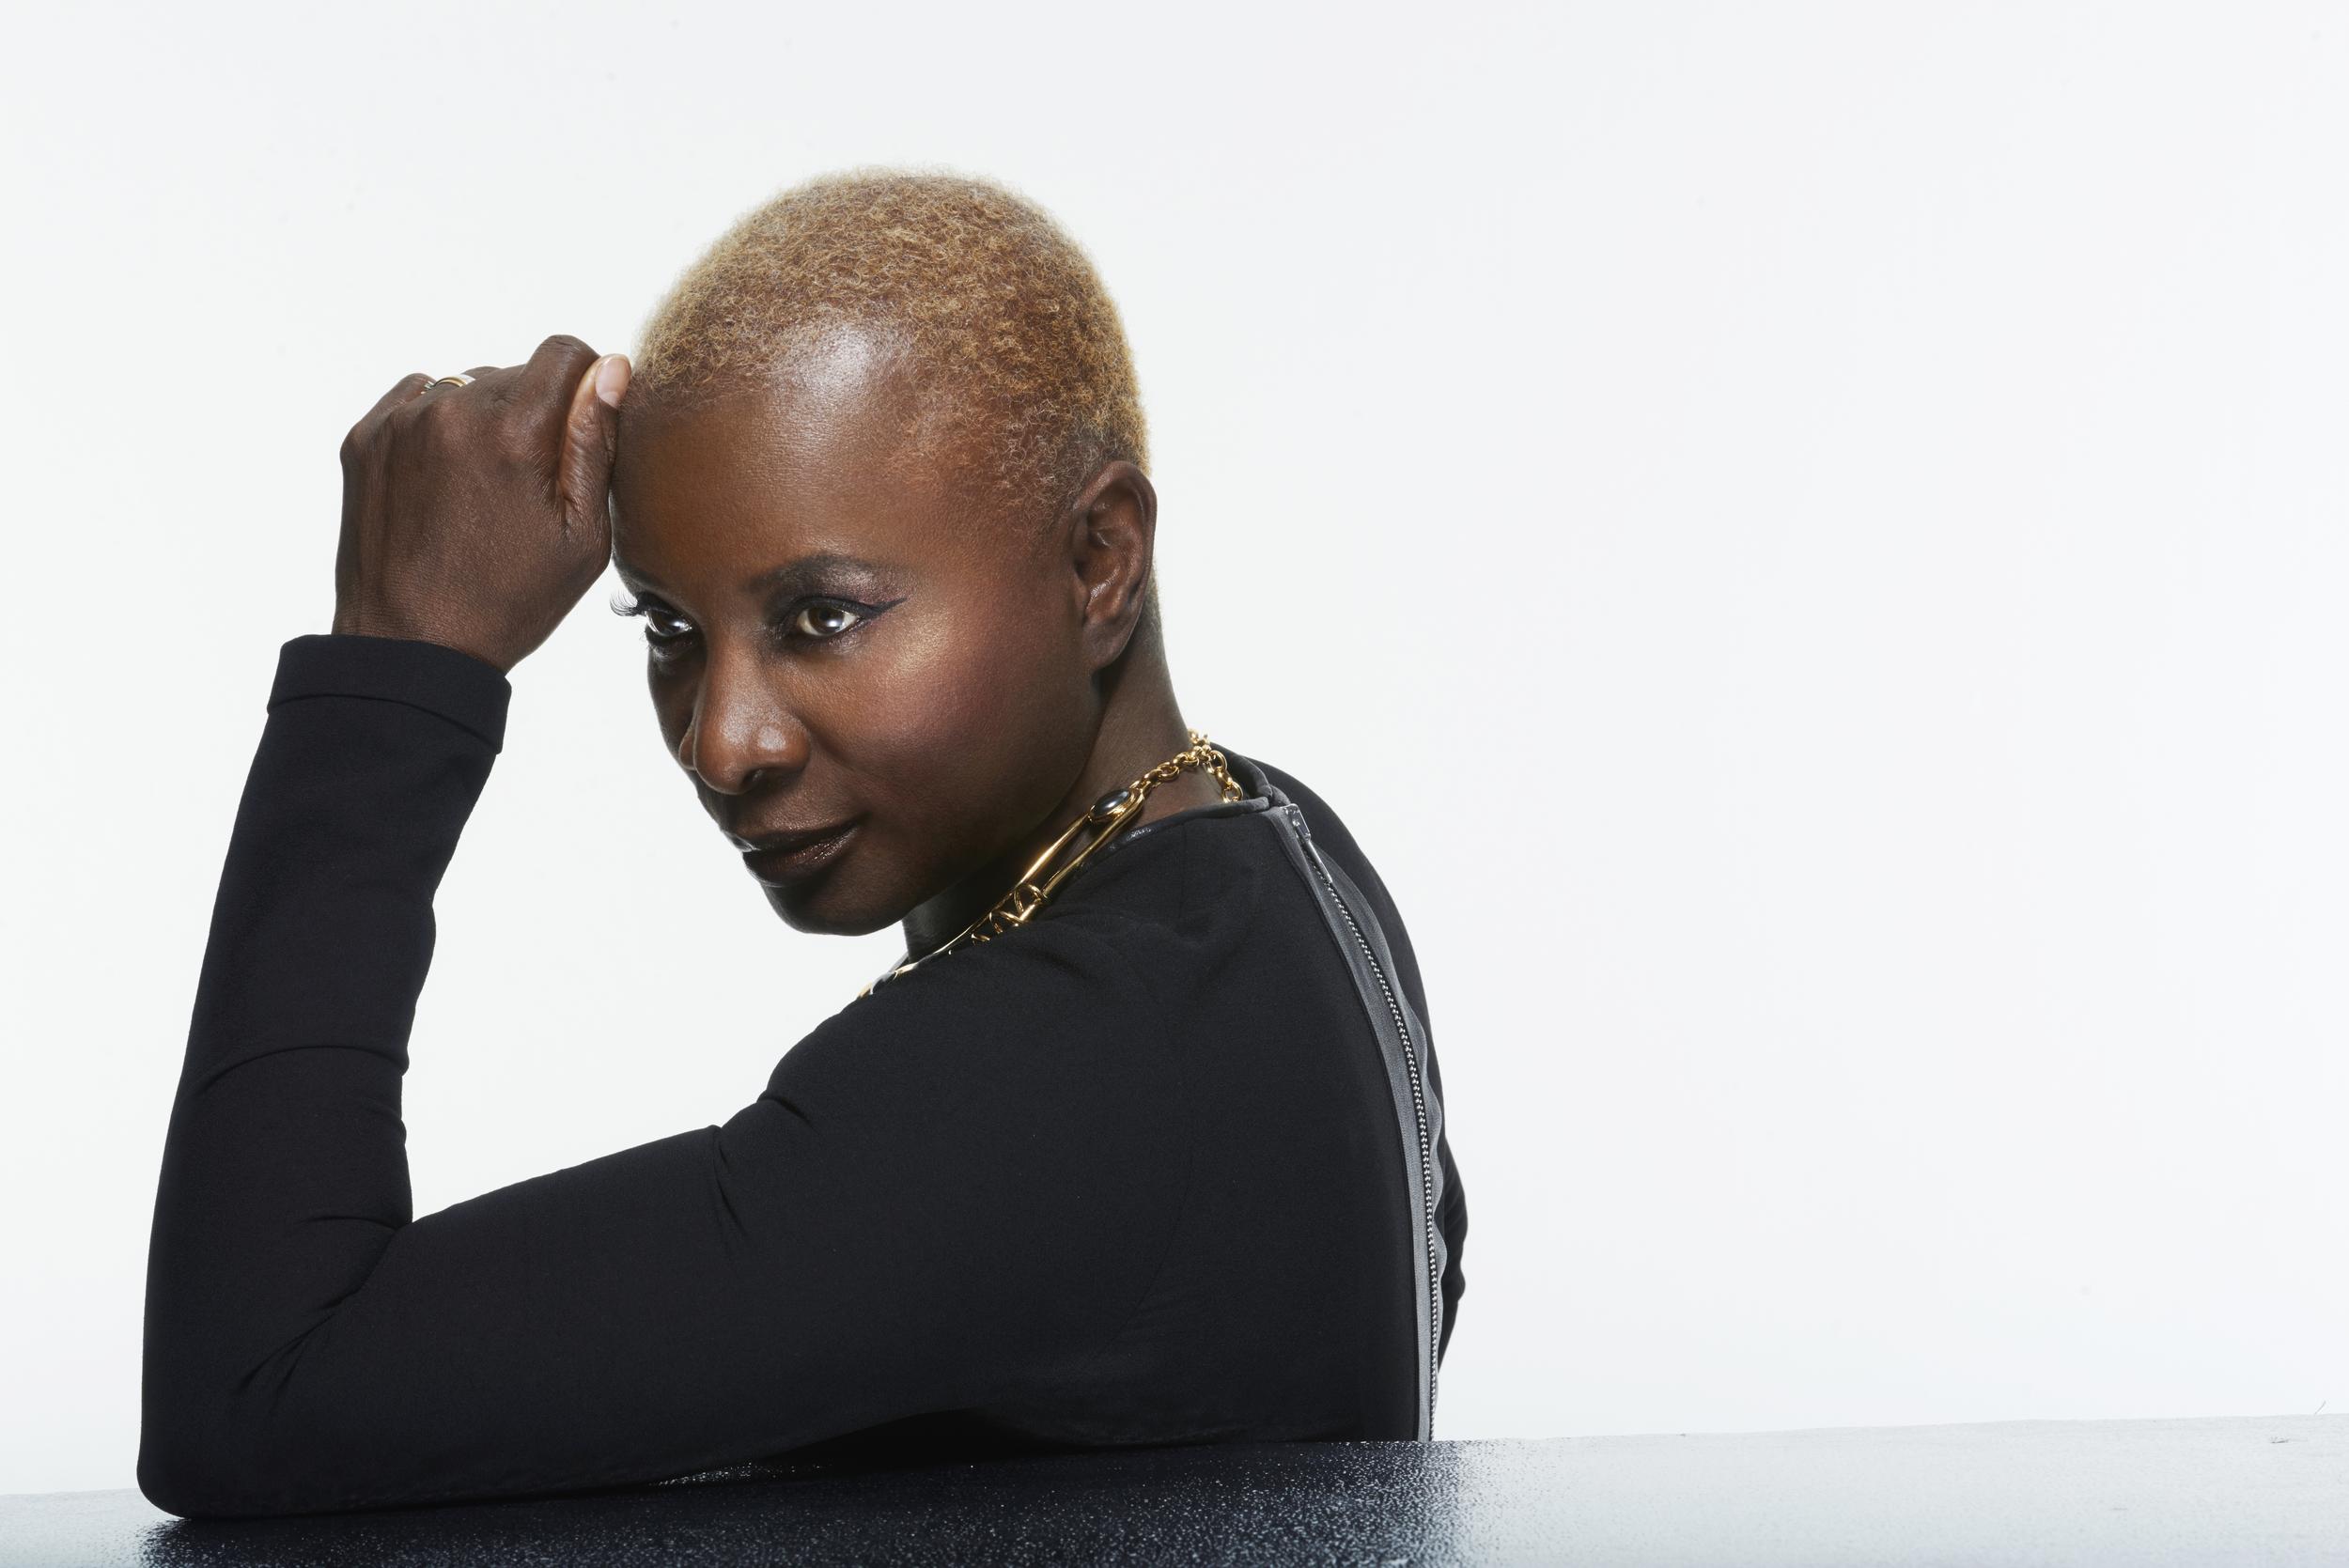 Angélique Kidjo. Photo by Gilles Marie Zimmerman.